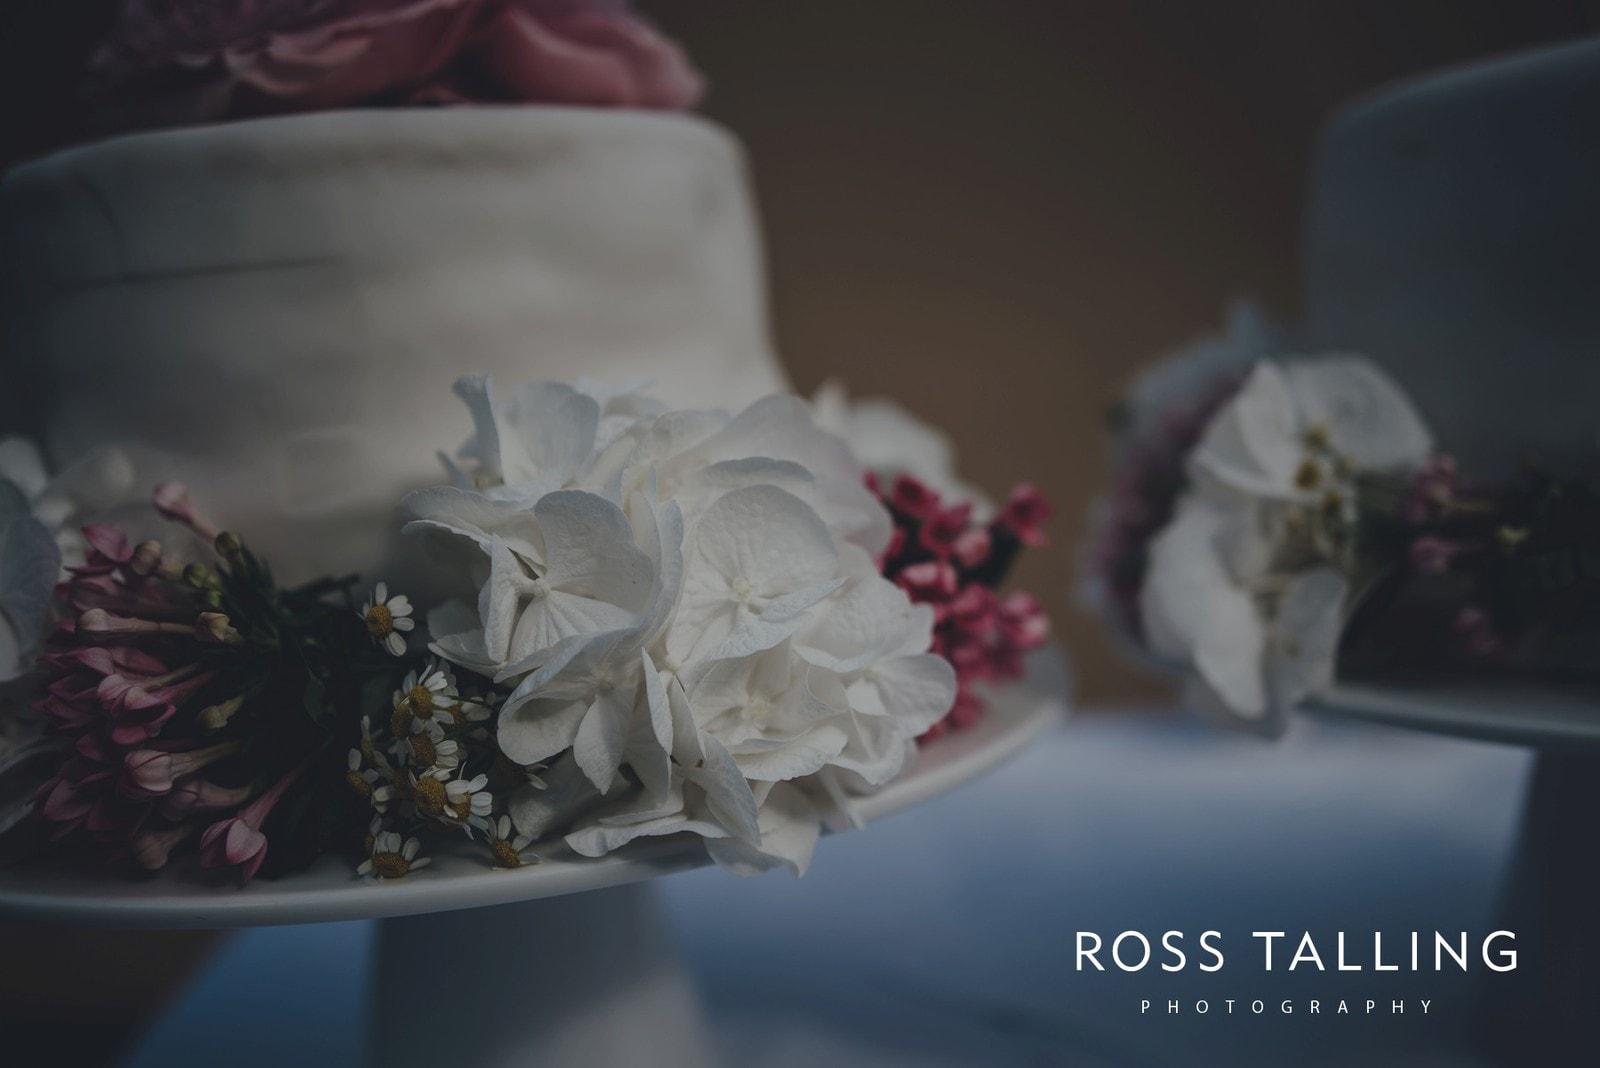 laura-matts-rosevine-hotel-wedding-photography-cornwall_0117